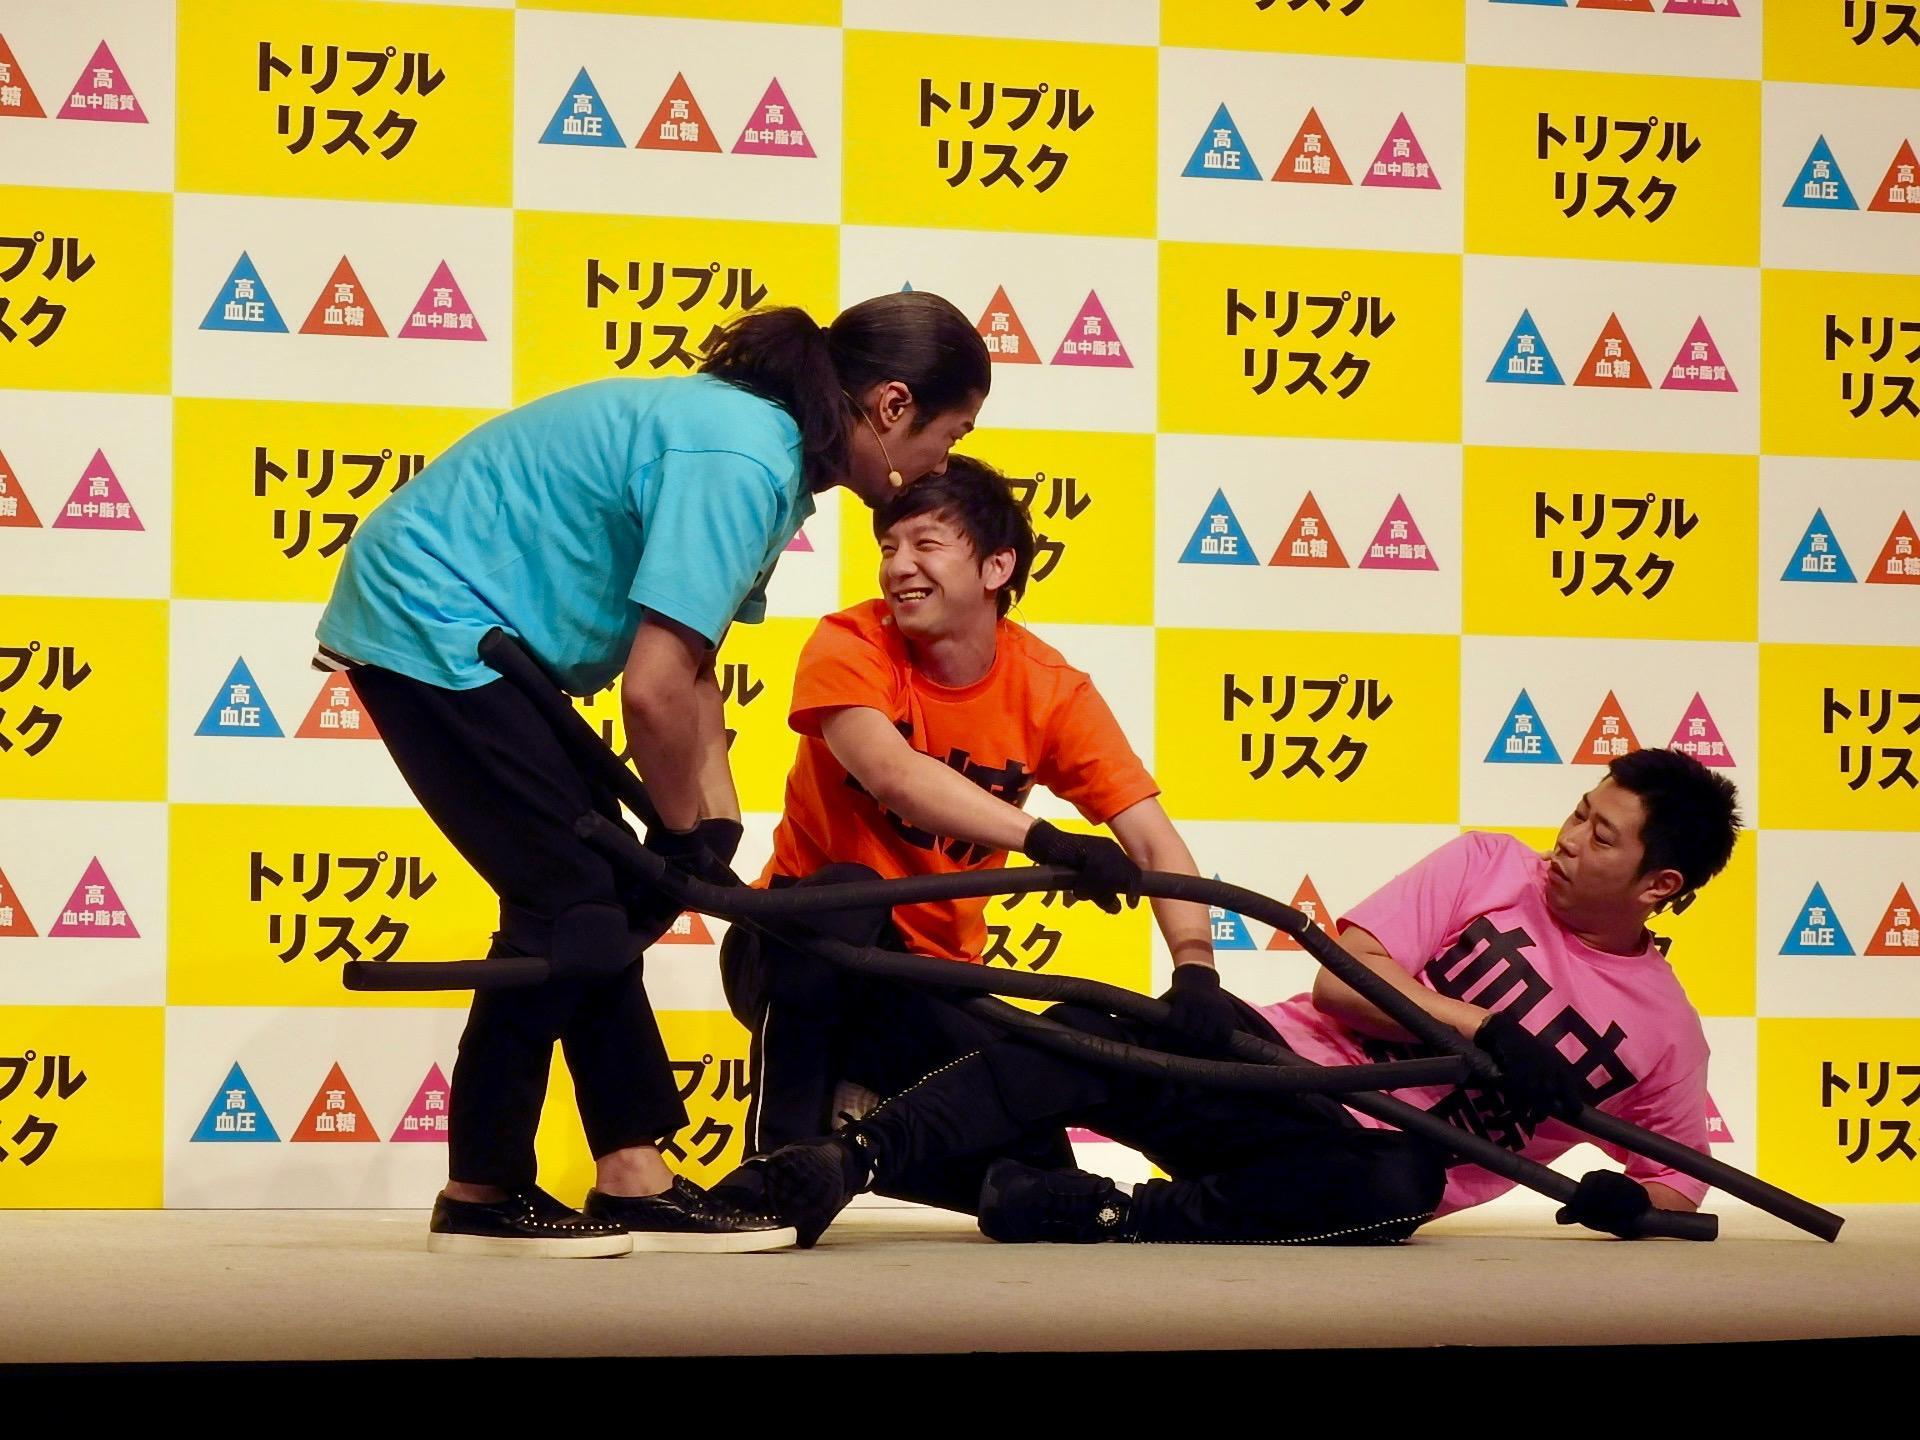 http://news.yoshimoto.co.jp/20180227230920-da3782148e823f3d449ae410054433841f6af749.jpg